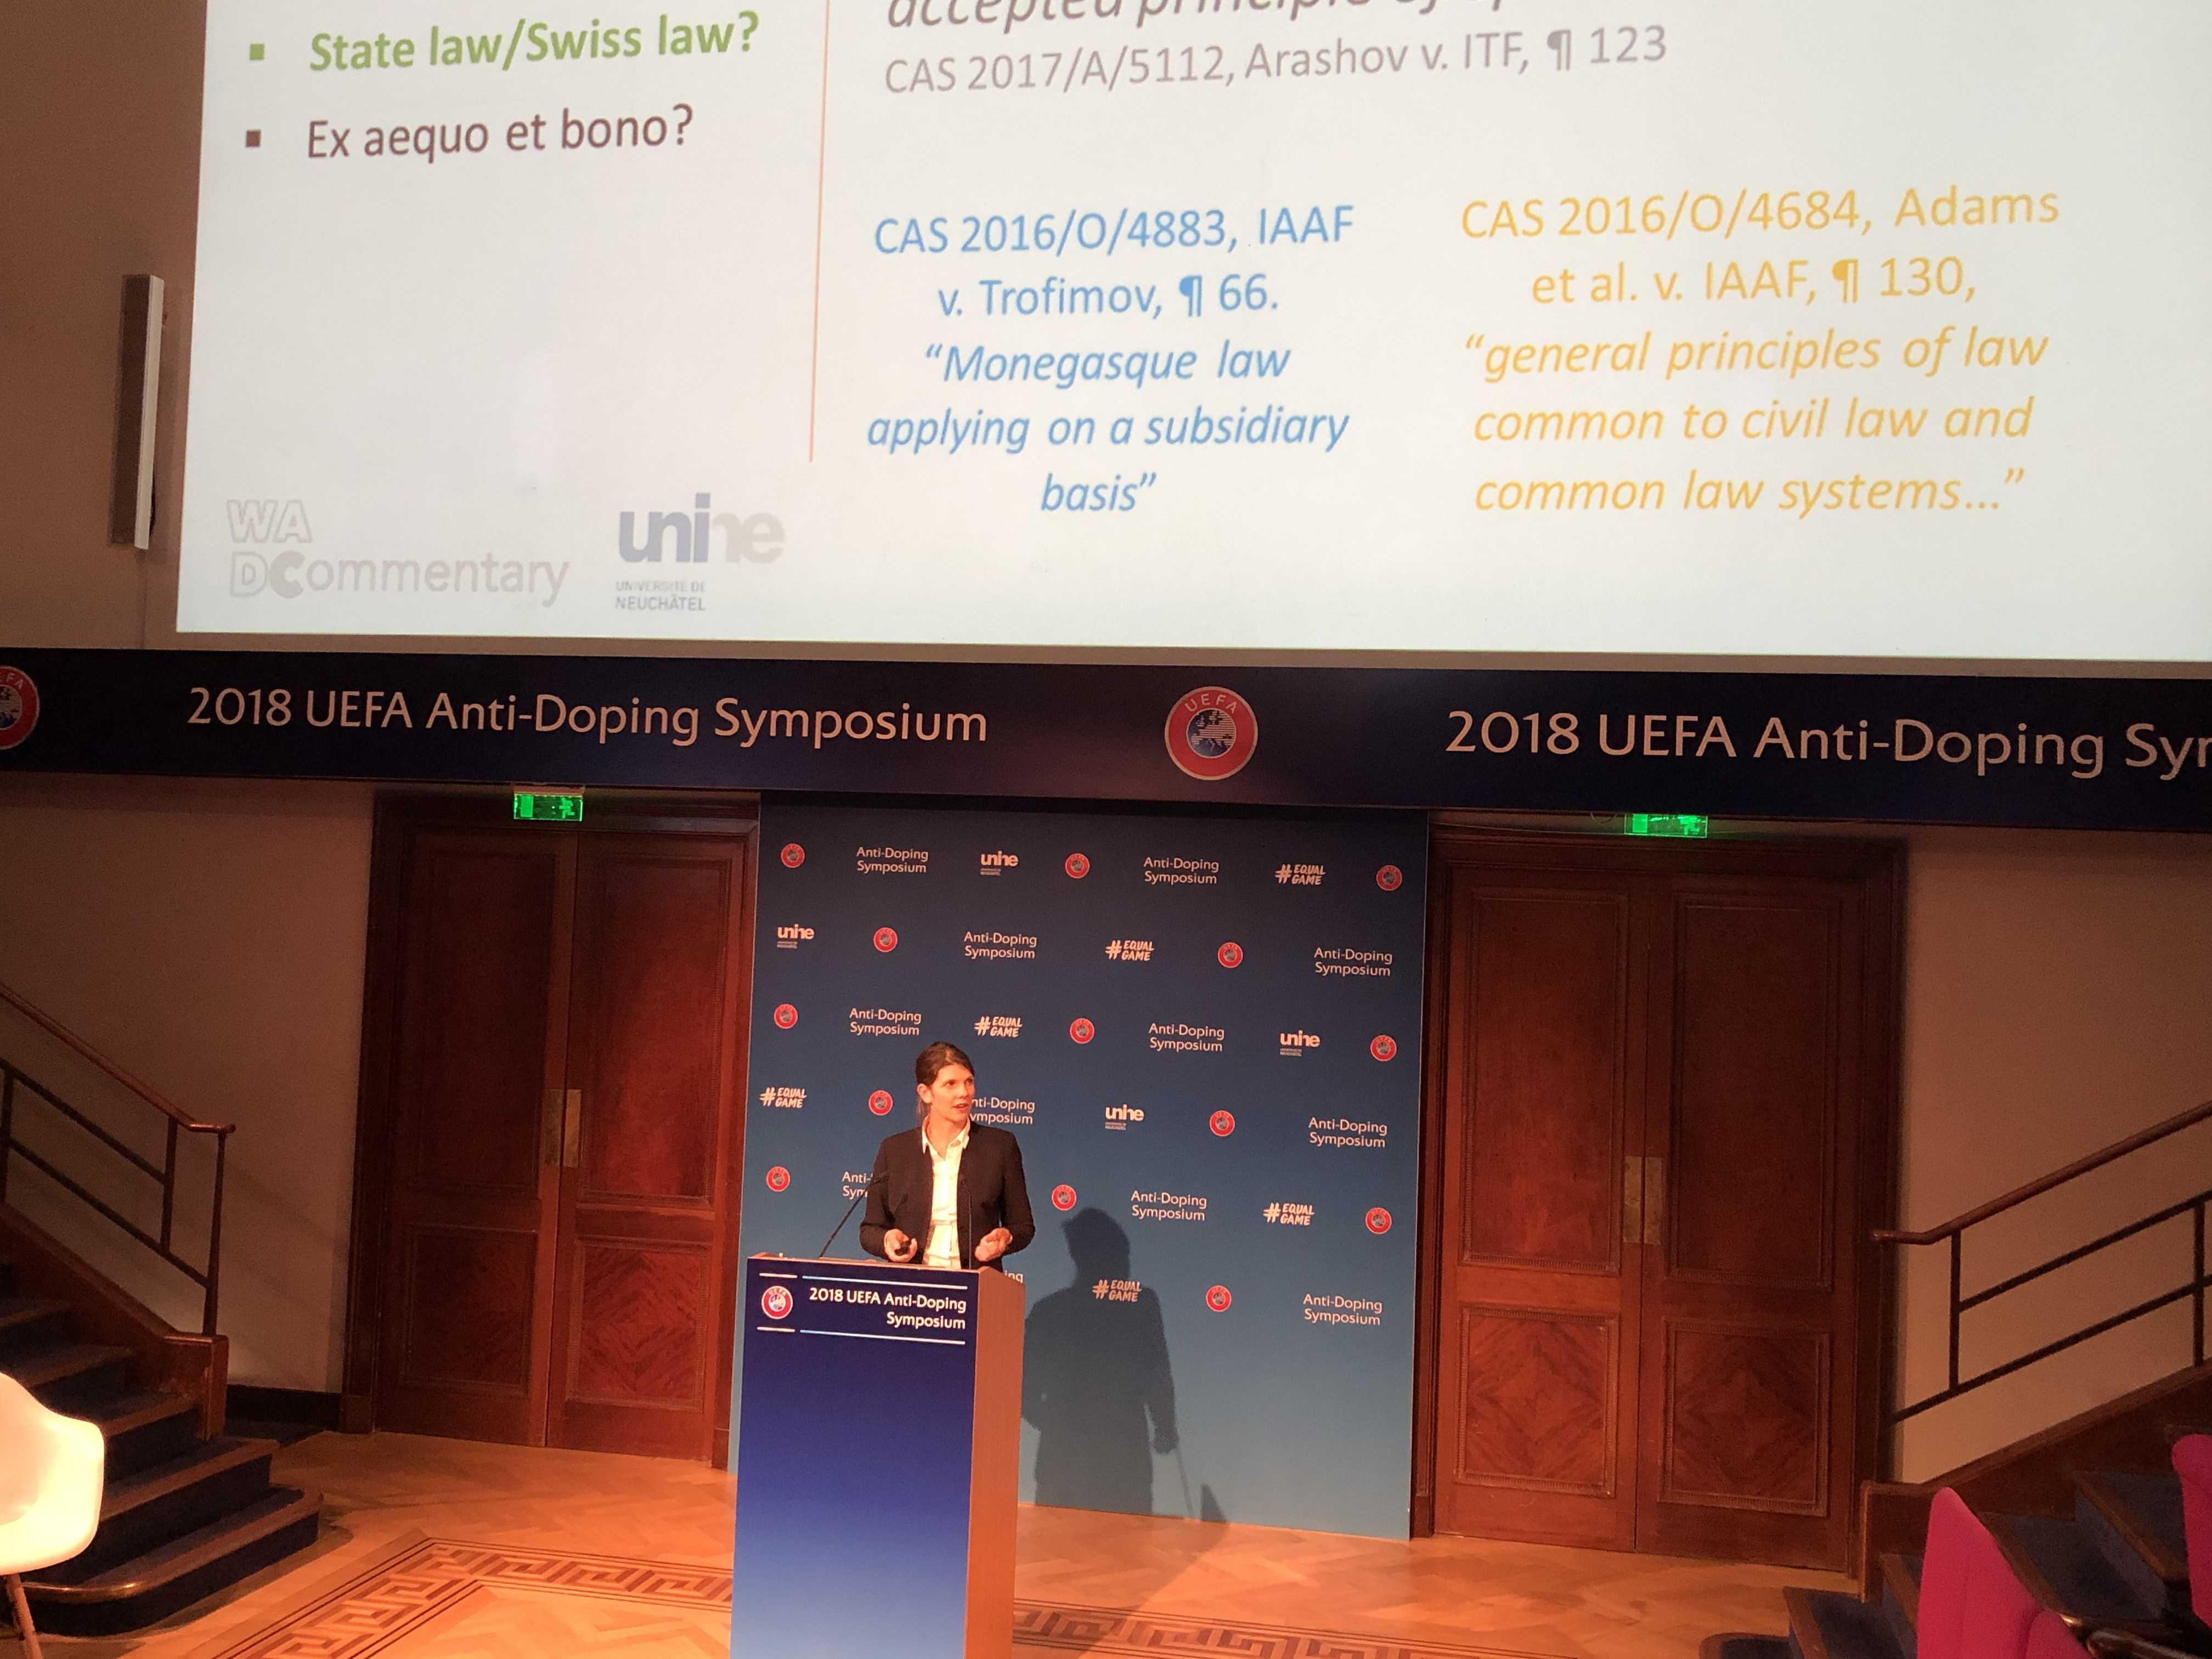 WISNOSKY Emily at UEFA Anti-Doping Symposium 2018 in London